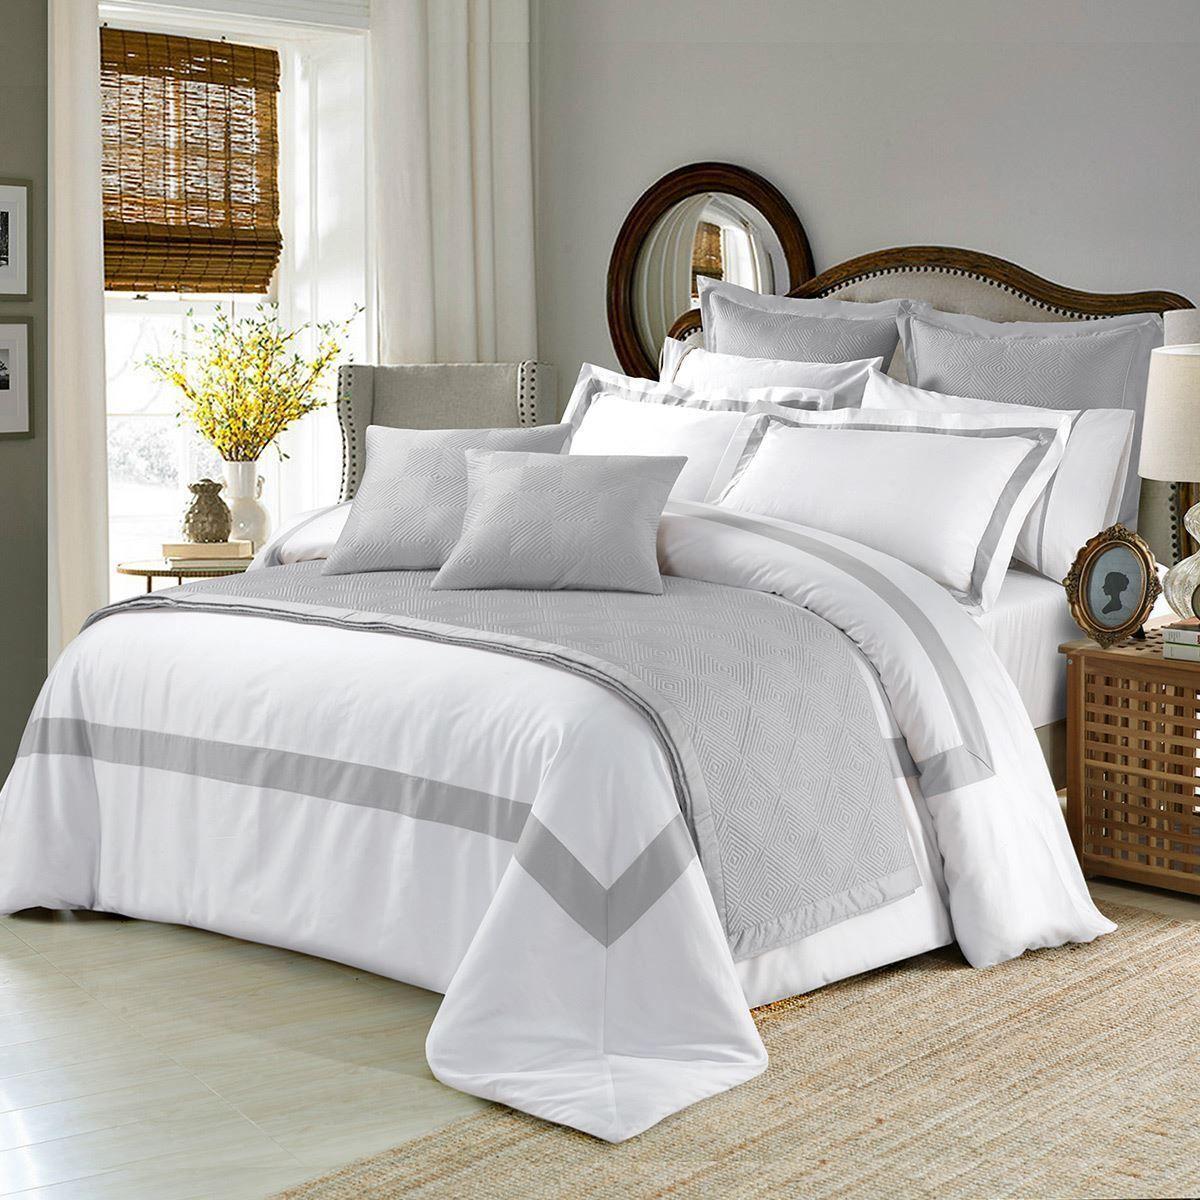 Best Cotton Ash Grey White Bedspread Sheet Pillows Bed 400 x 300